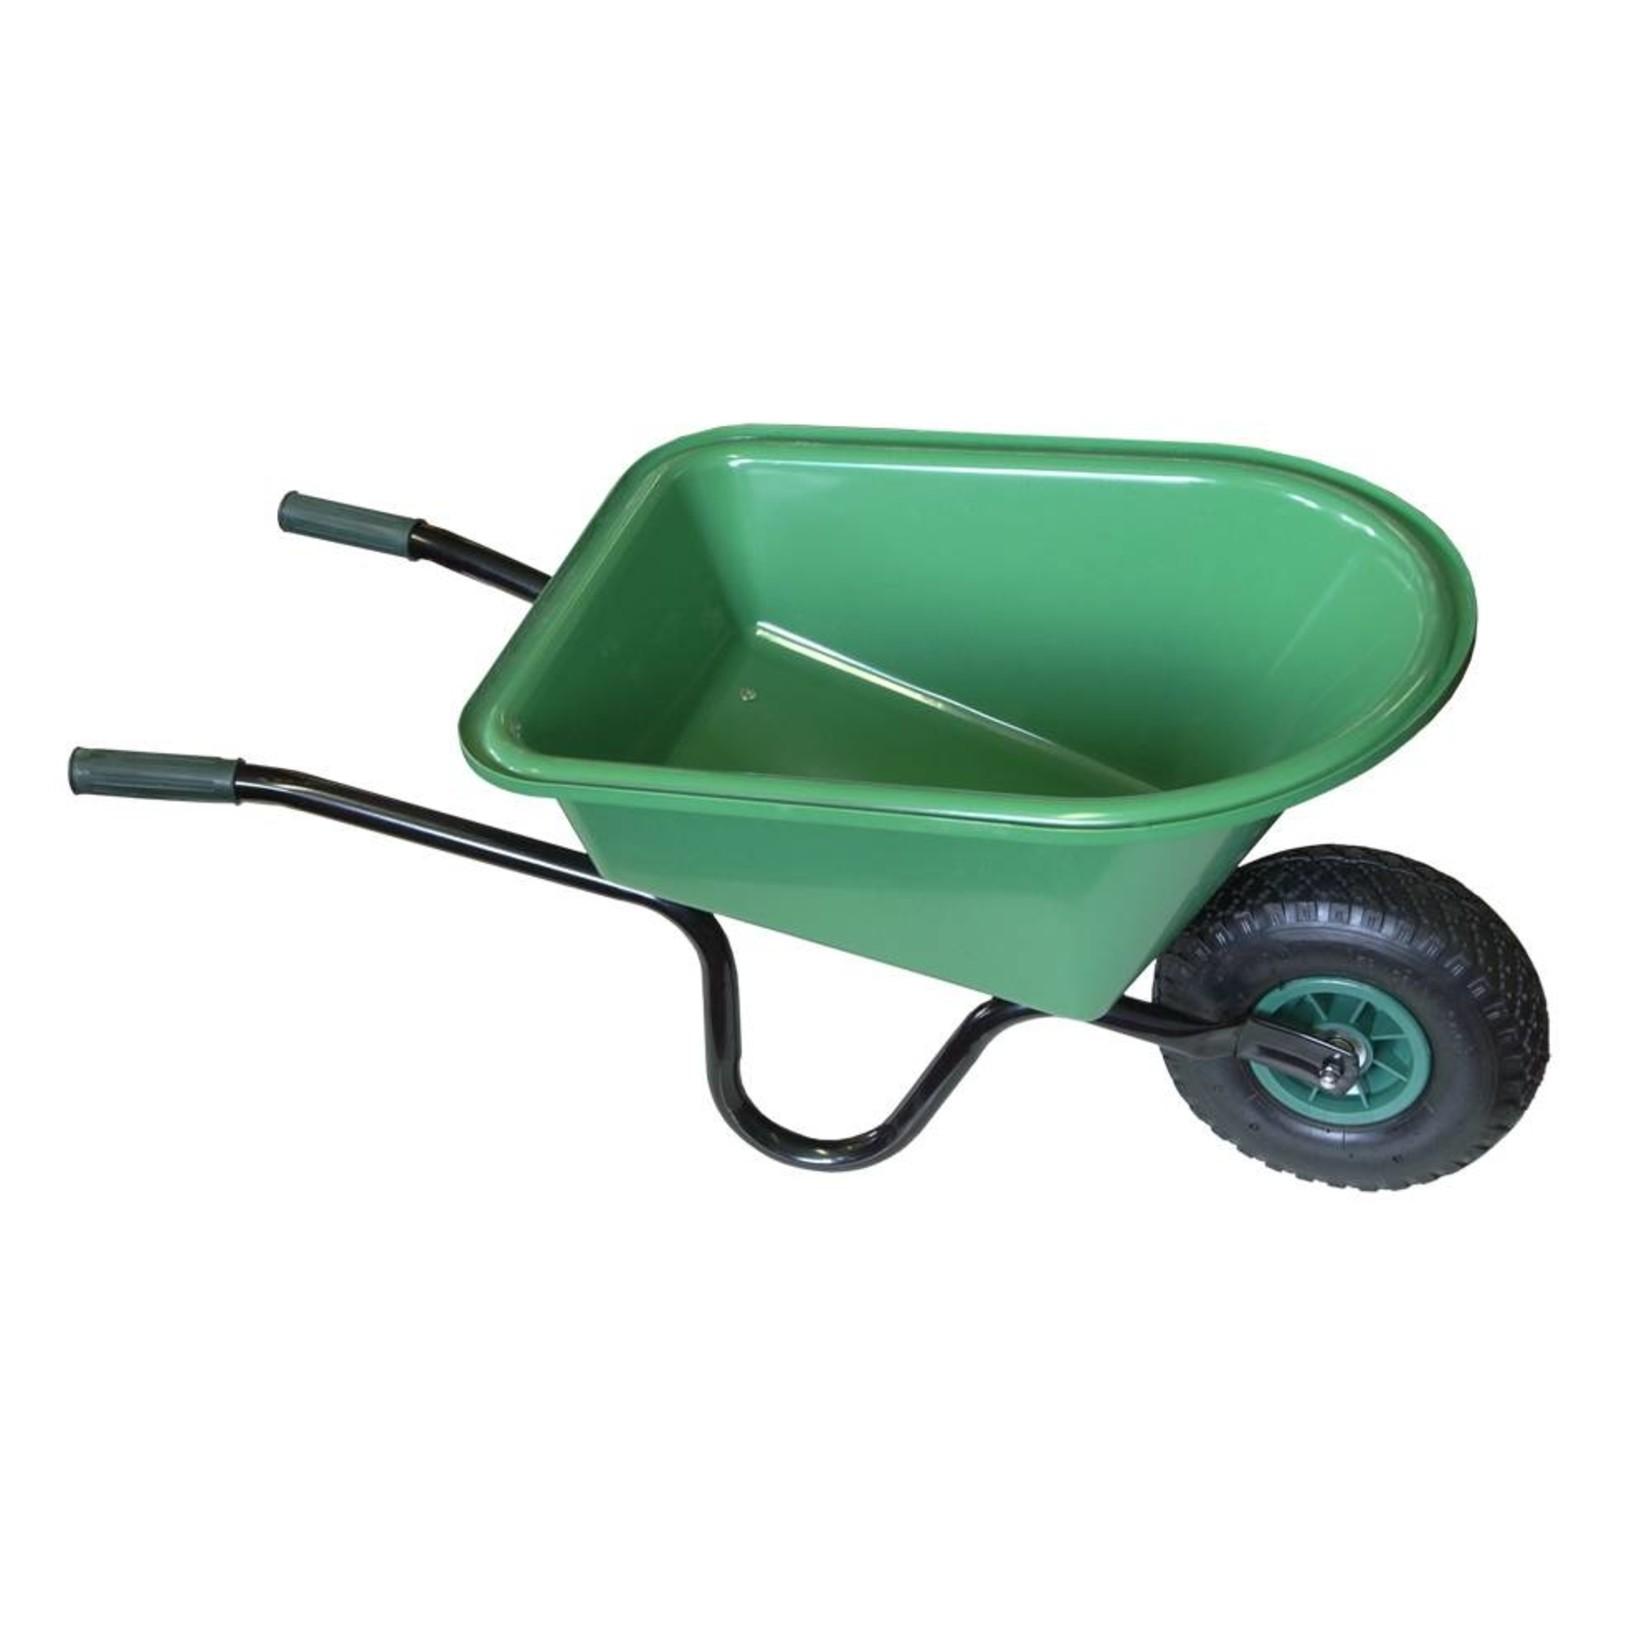 Meuwissen Agro Kinderkruiwagen Groen - bak 60 x 44 x 25/15 cm